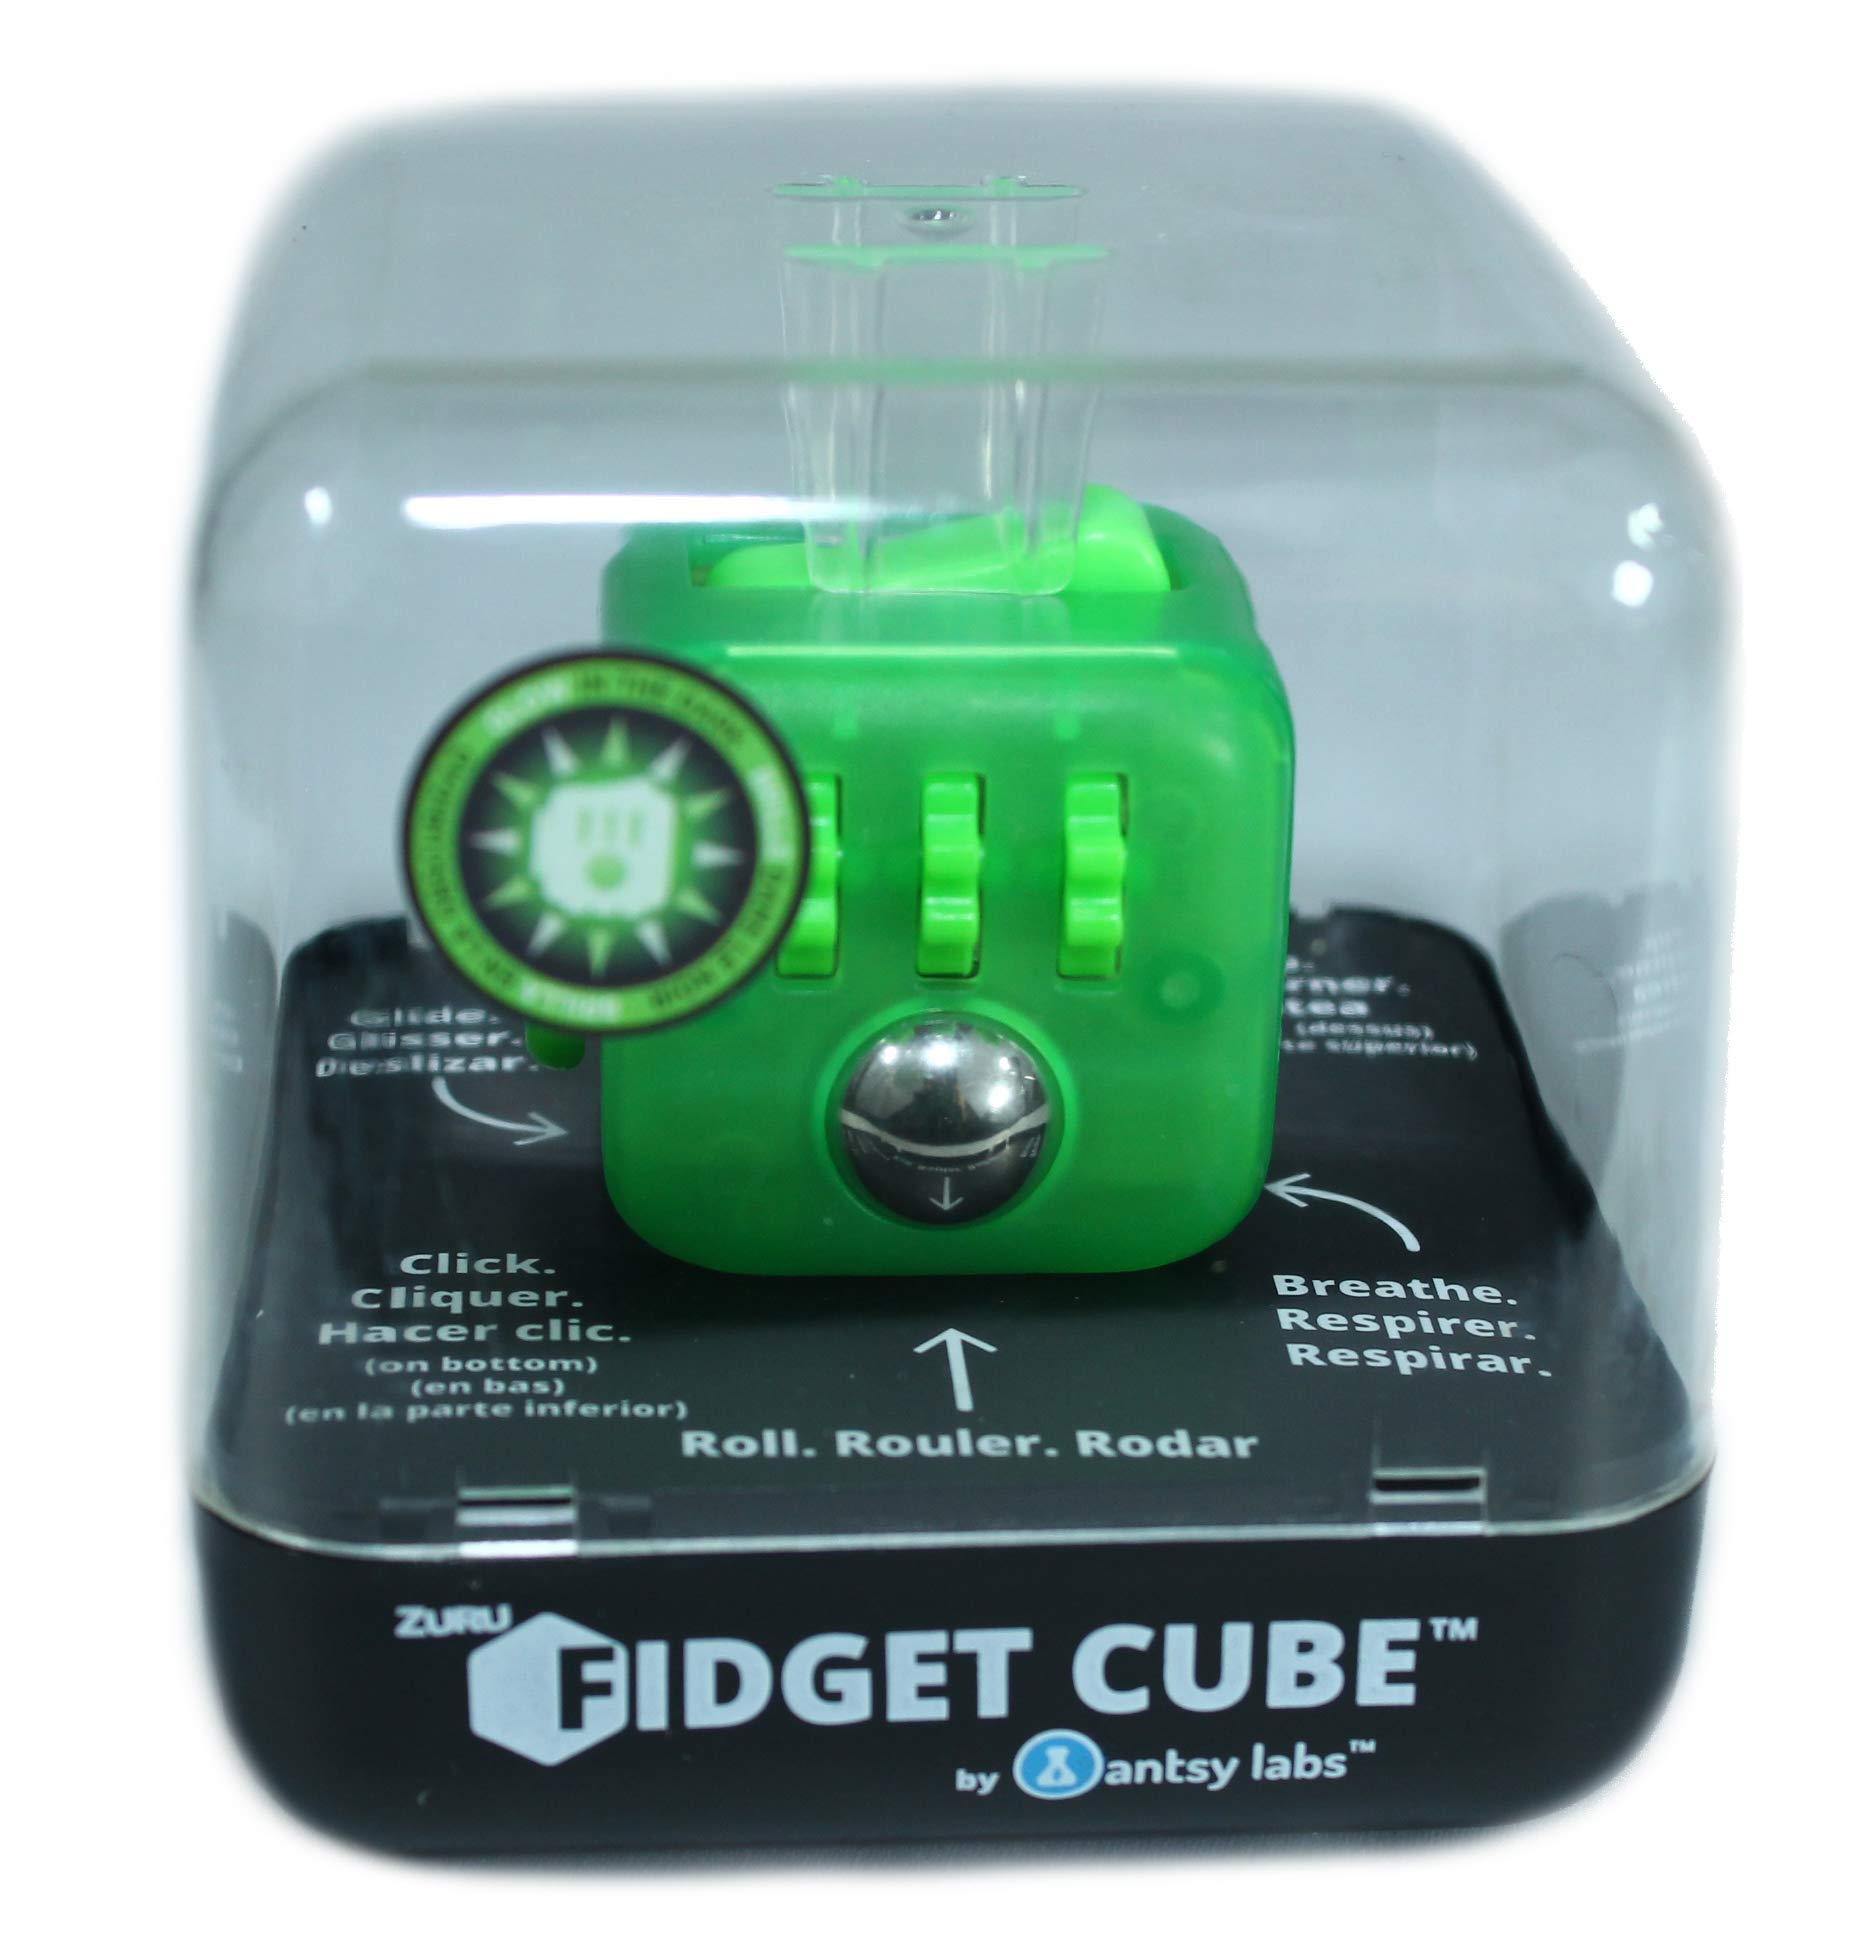 Zuru Fidget Cube by Antsy Labs - Custom Series (Transparent Neon Green) Glow in The Dark Fidget Cube by ZURU